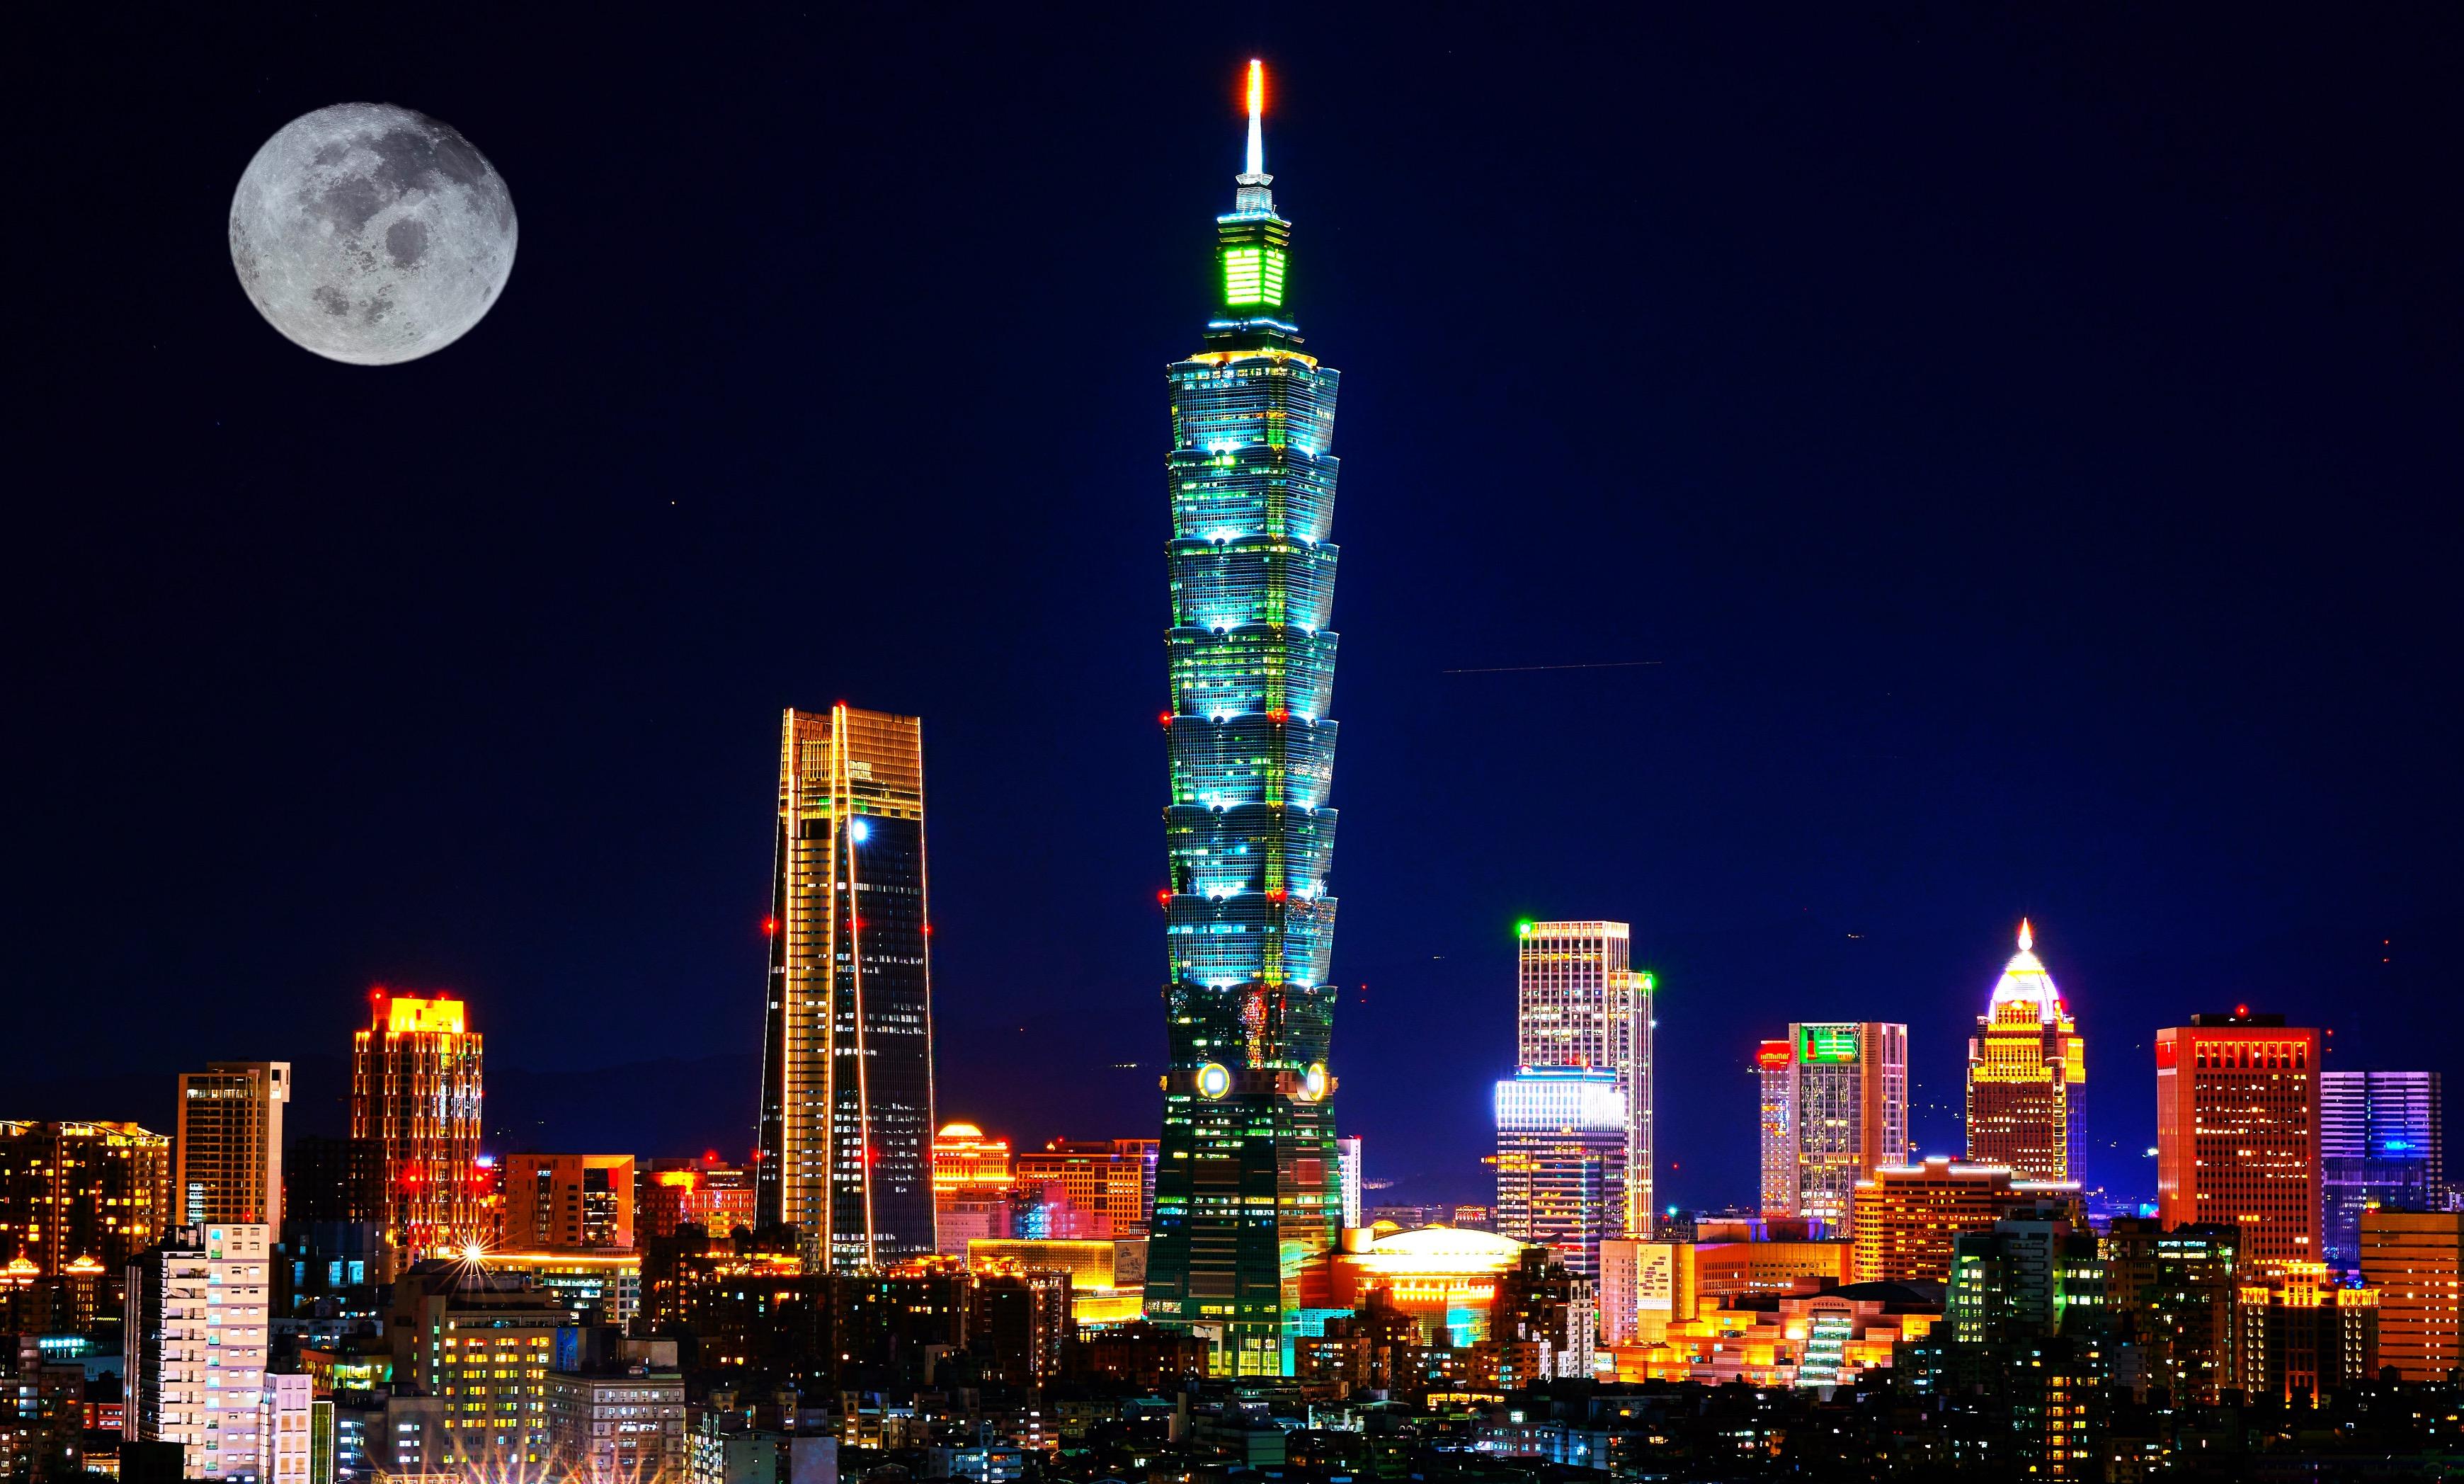 Goedkoop naar Azie met Xiamenair